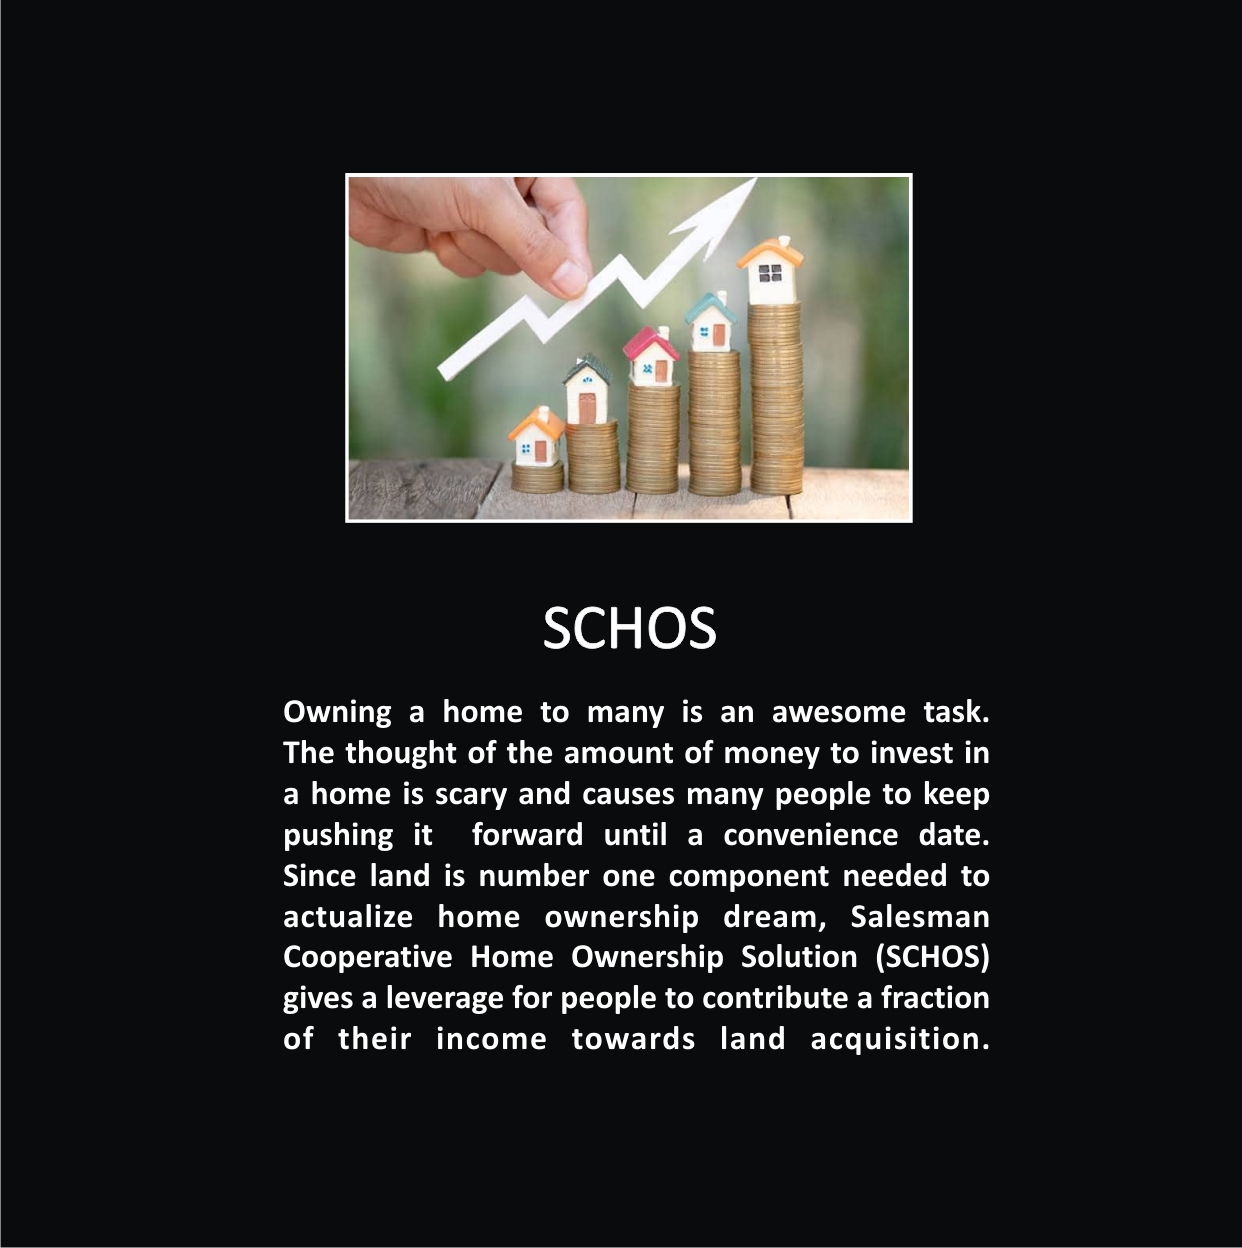 SCHOS Package